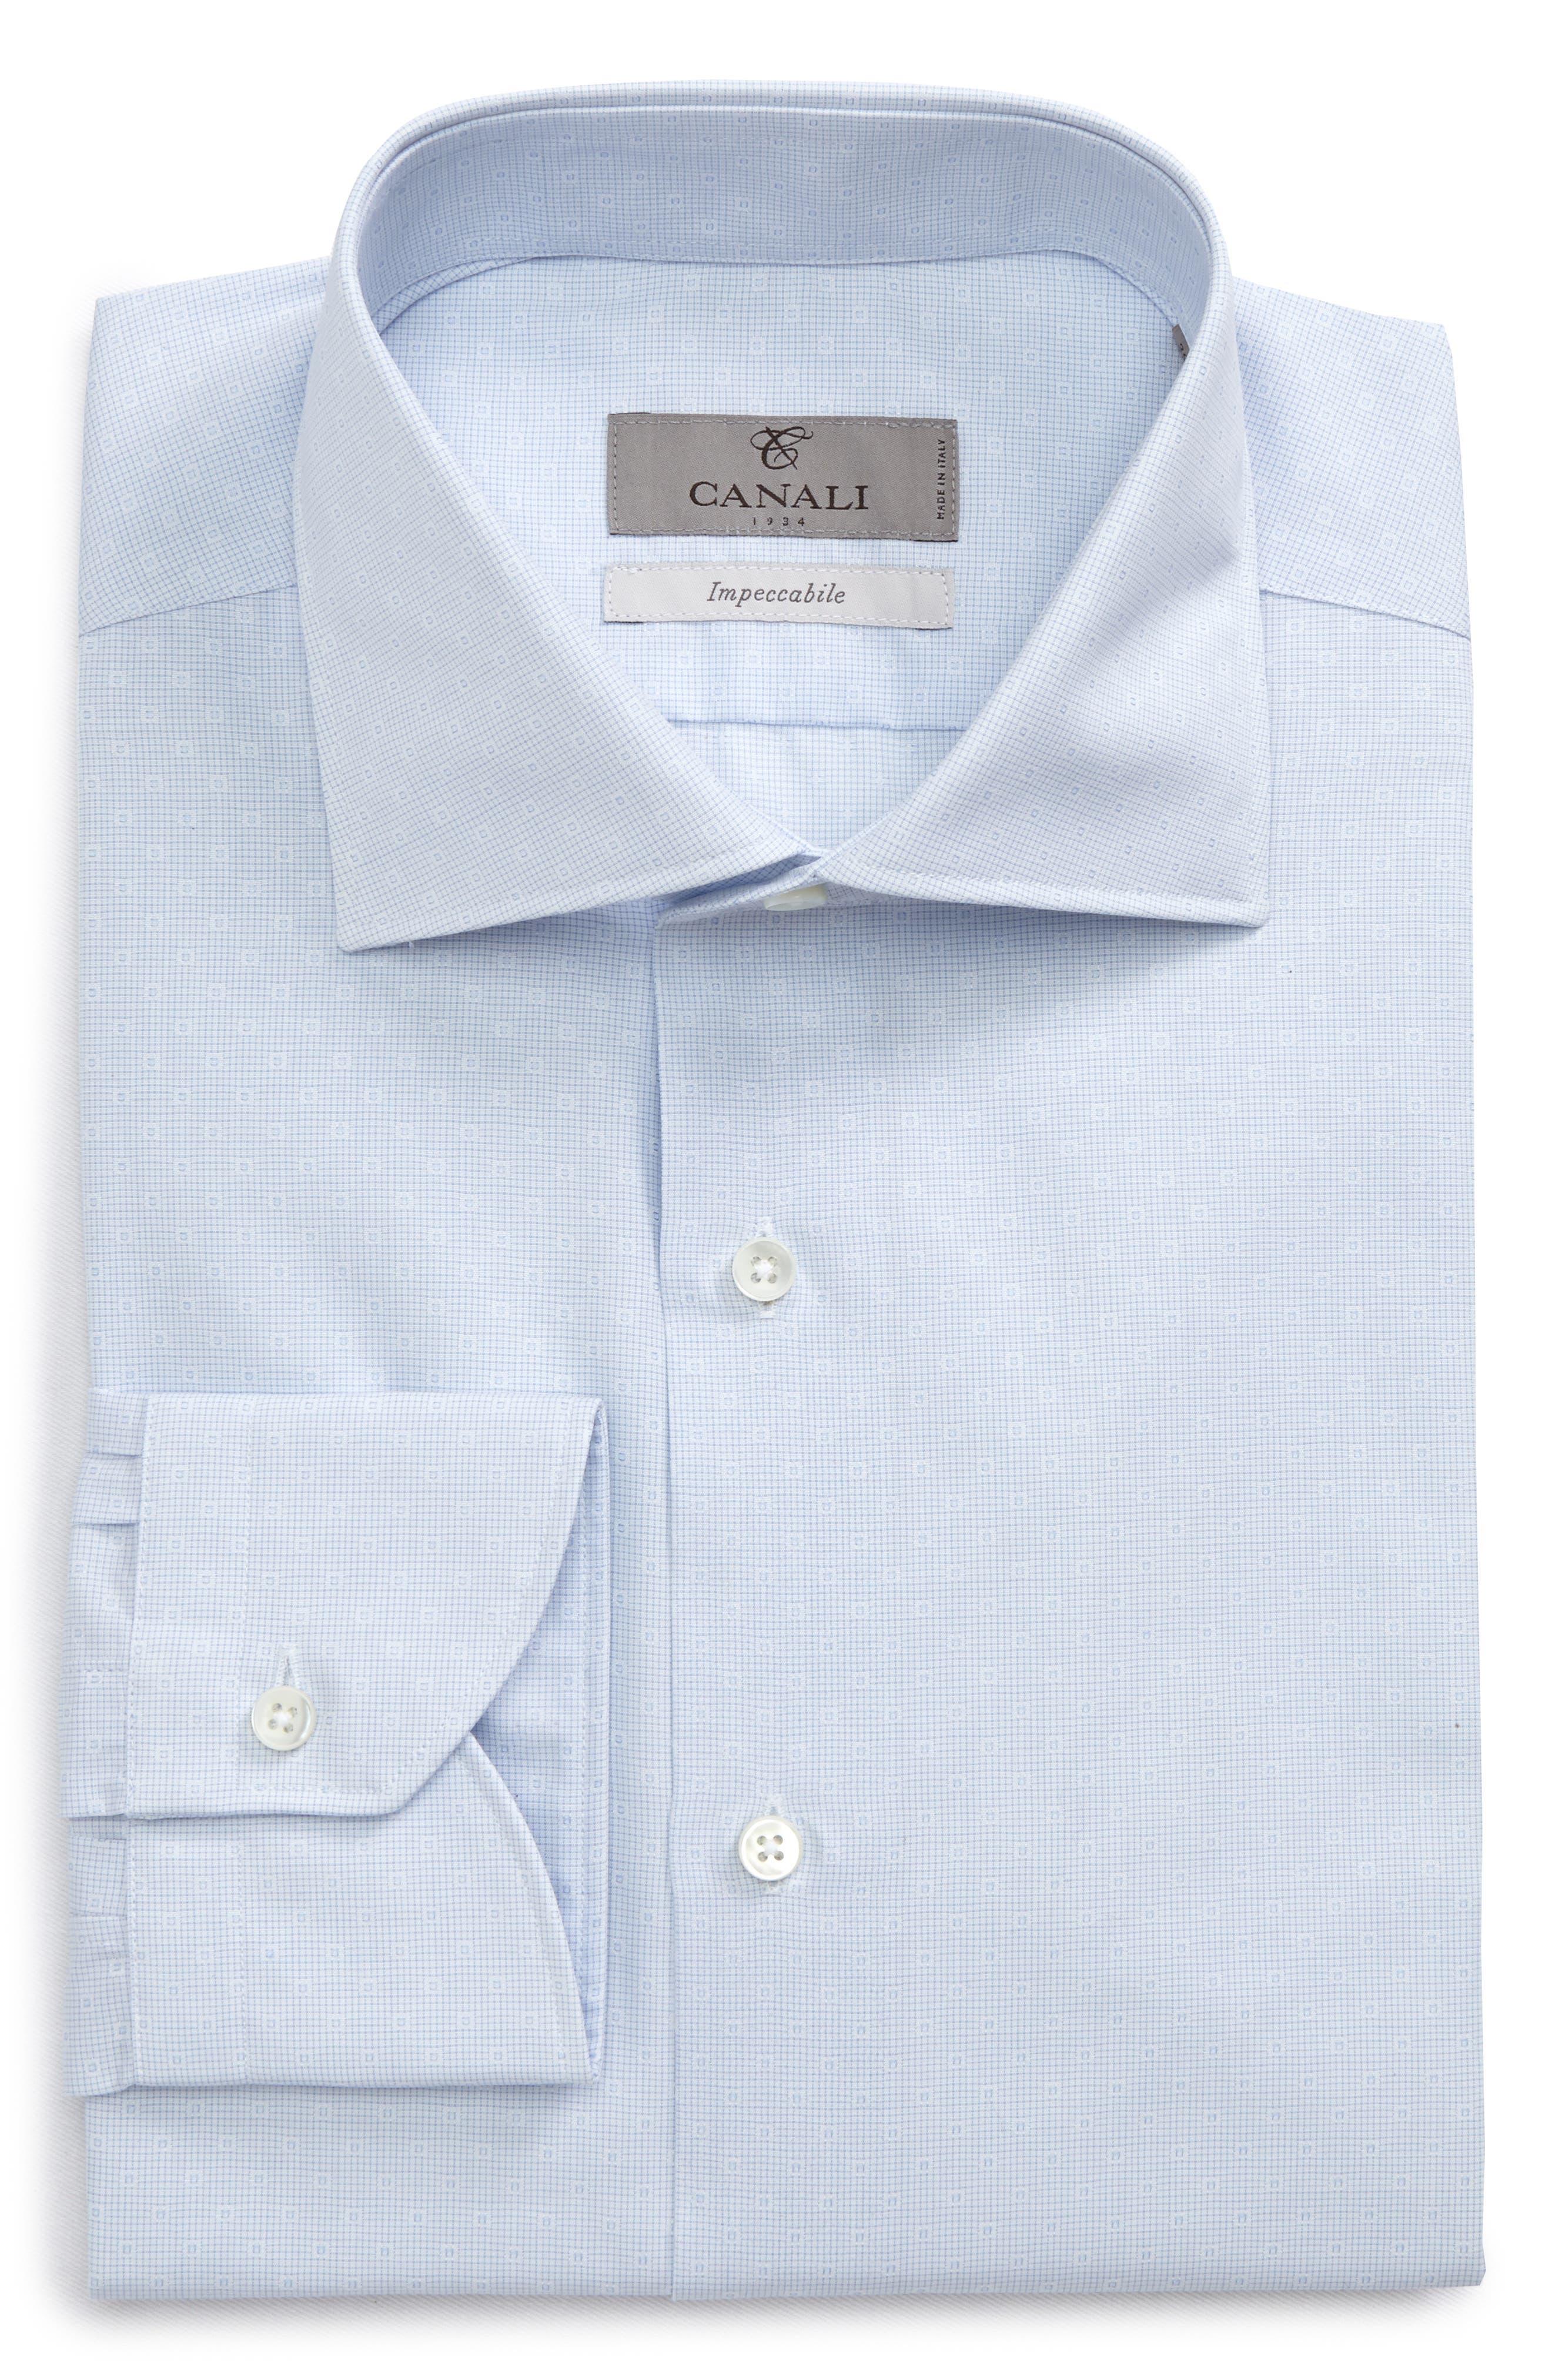 Canali Regular Fit Dobby Check Dress Shirt